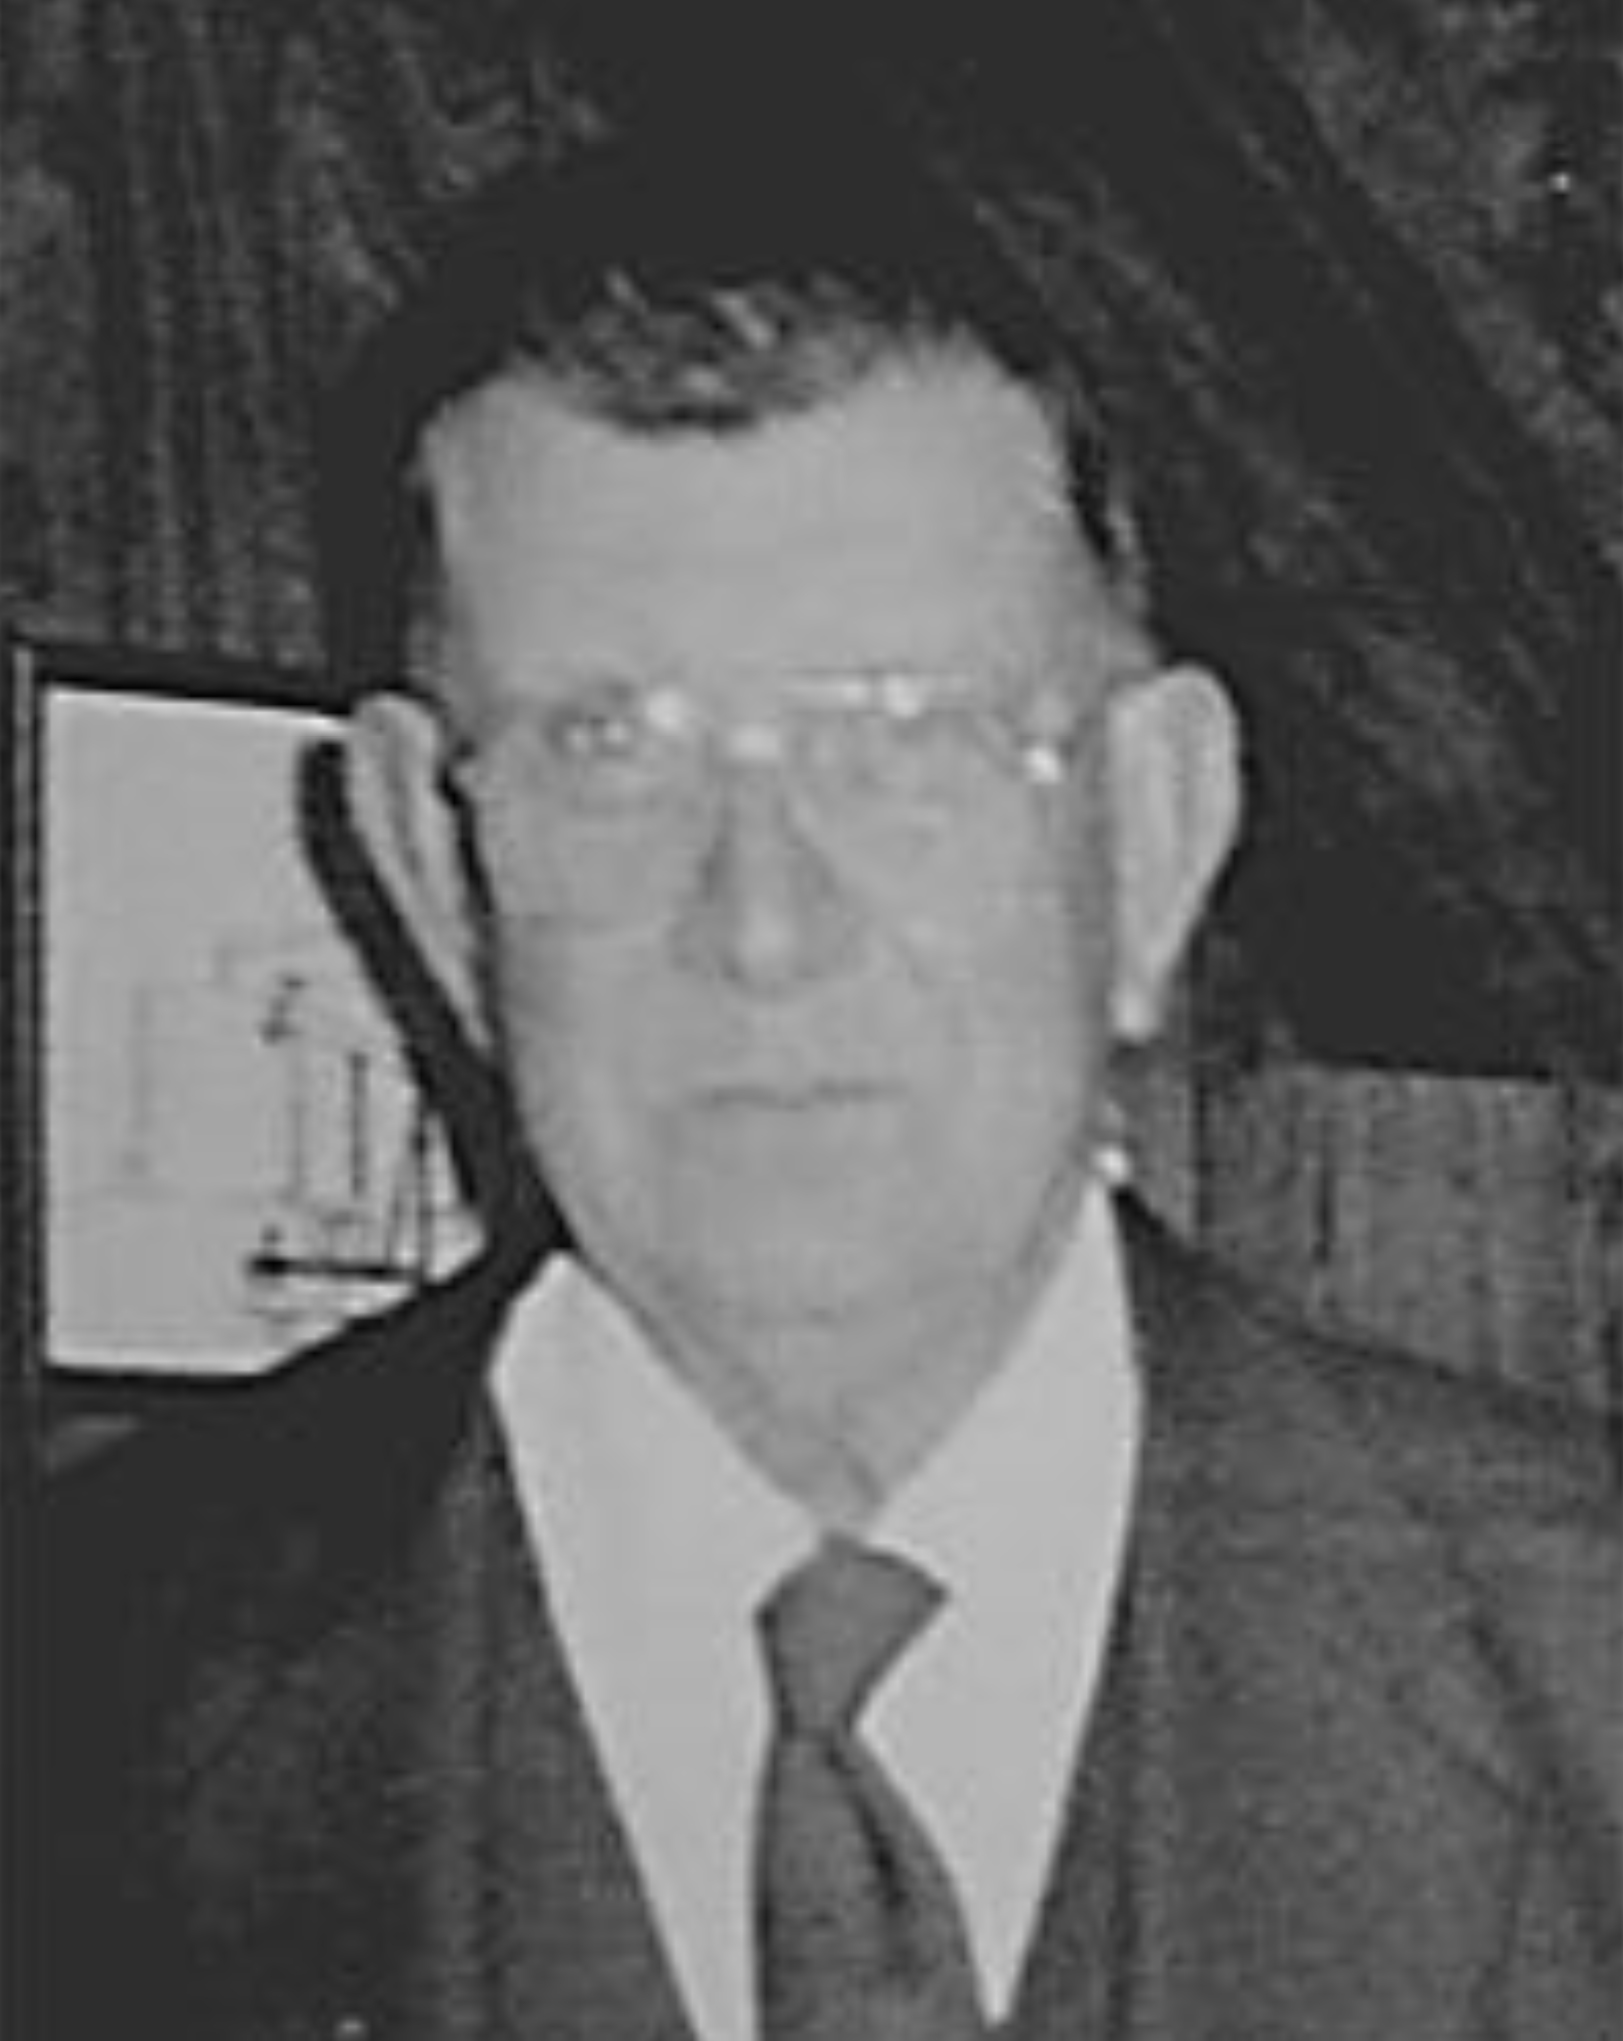 JERRY J. RANES